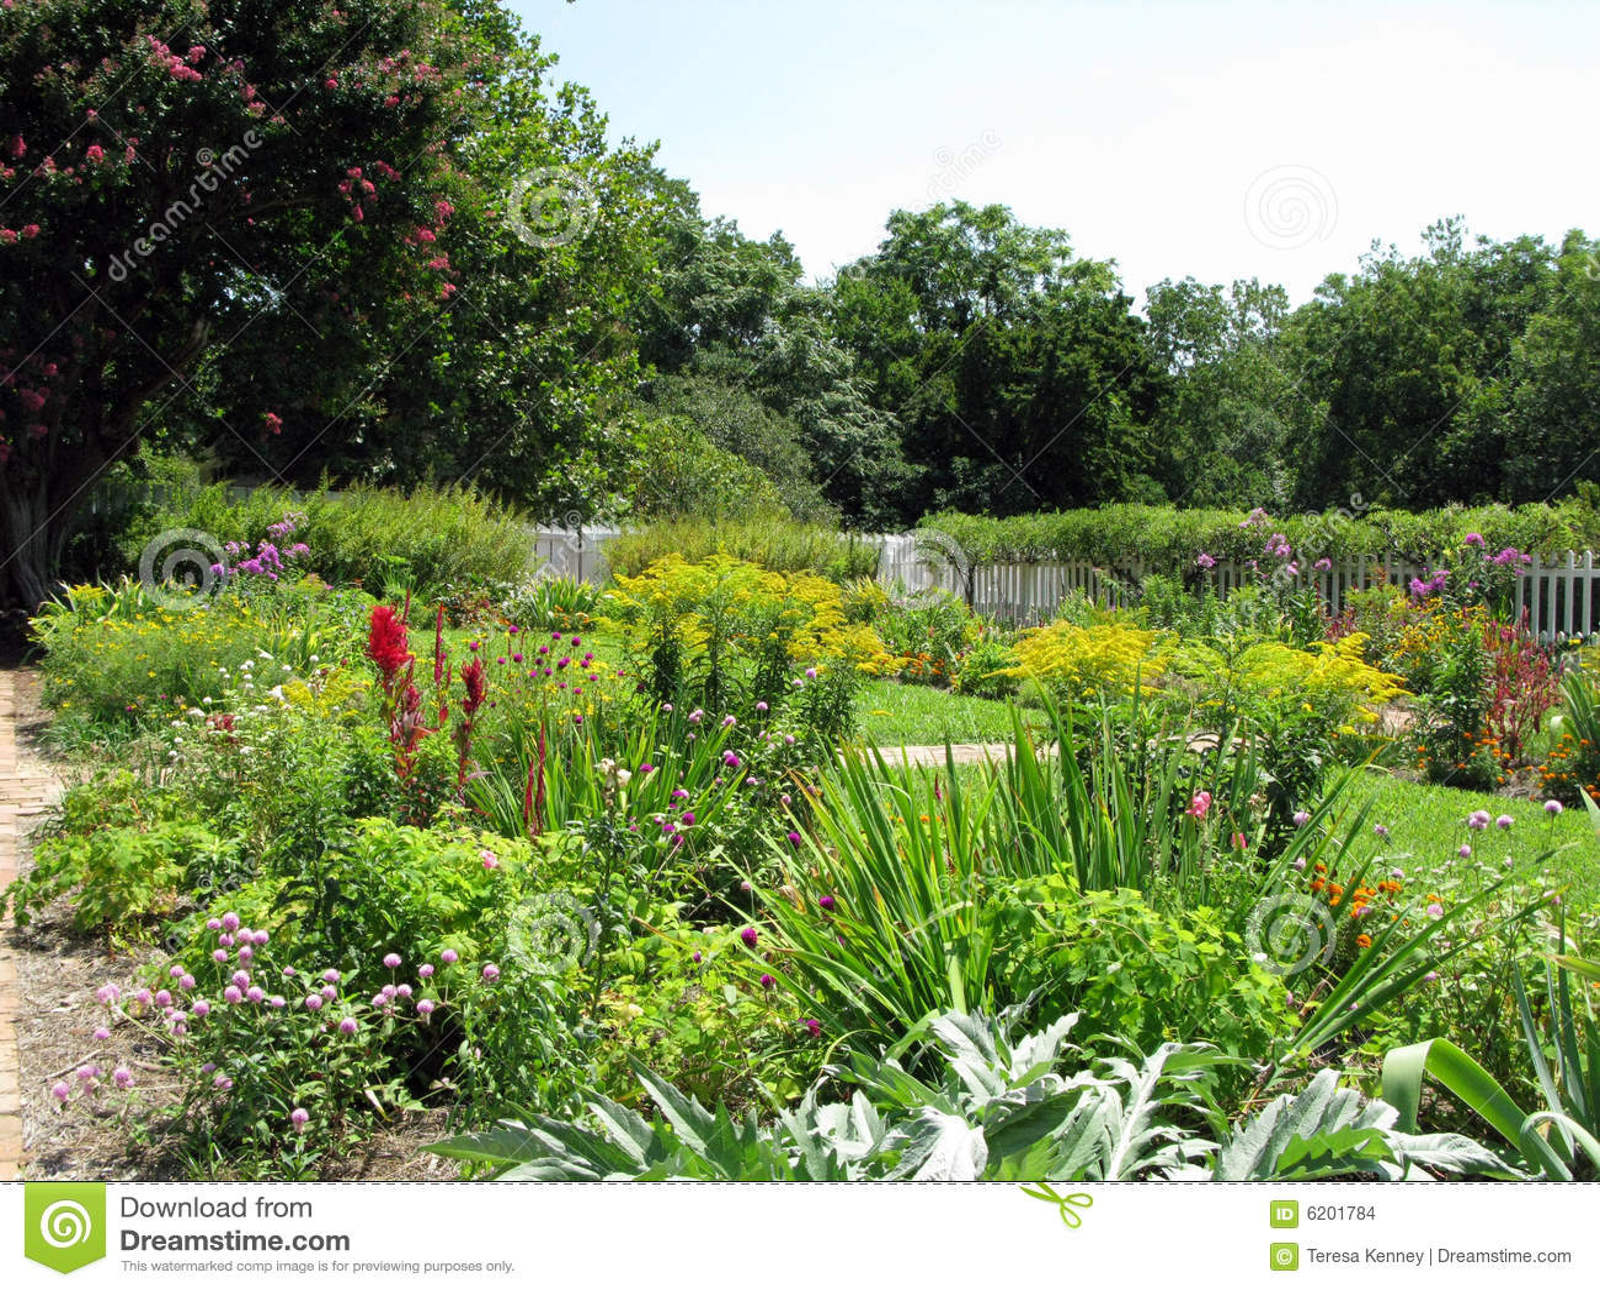 imagens jardins lindos:Beautiful Residential Gardens